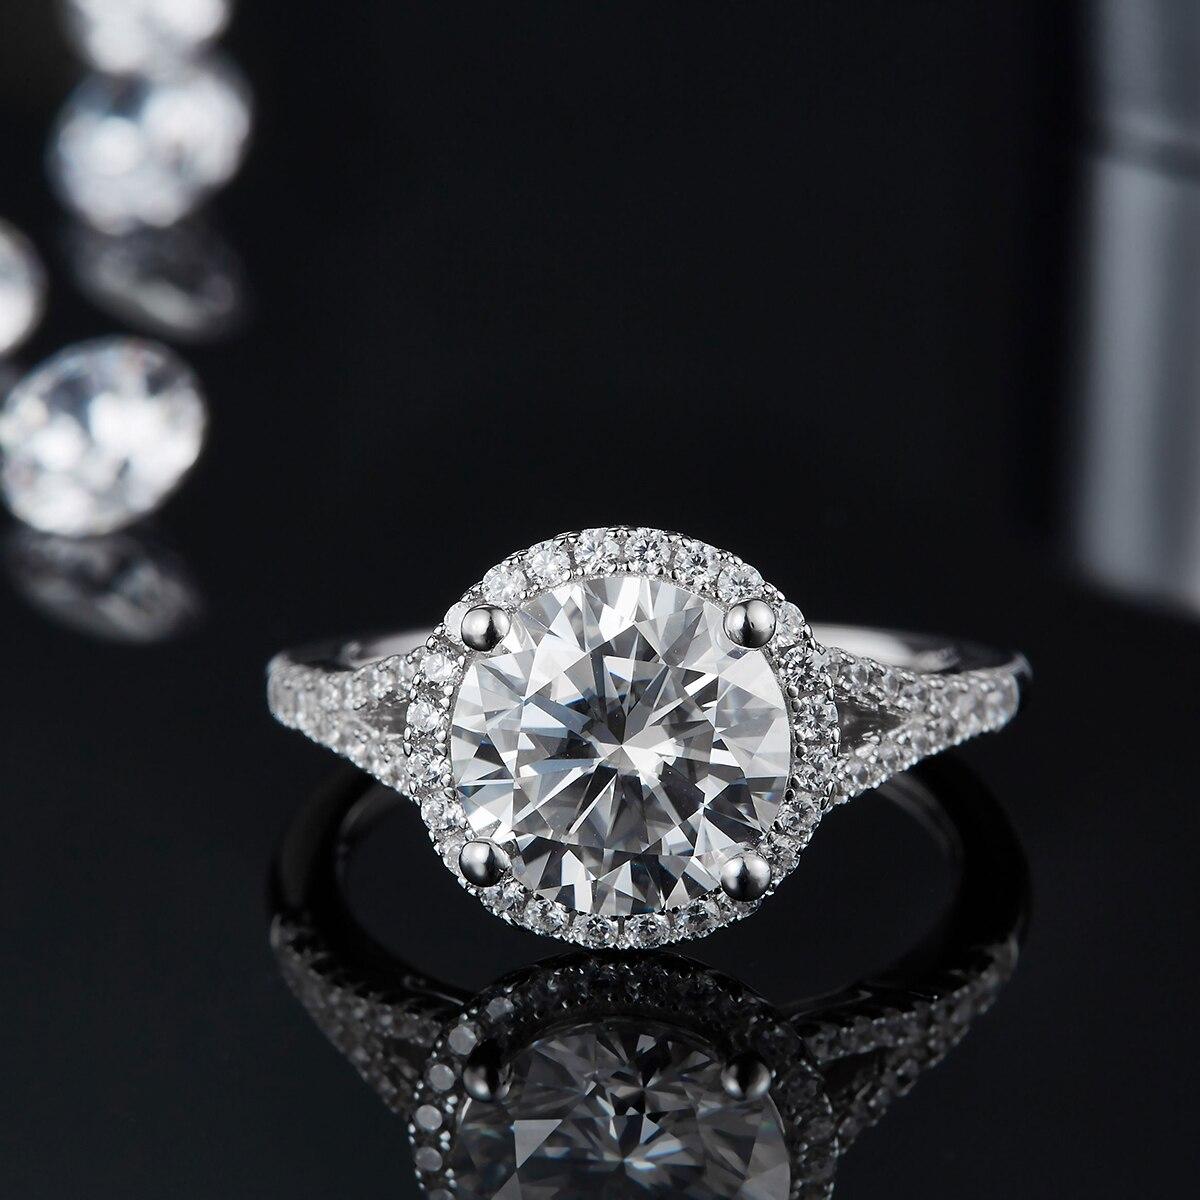 BOEYCJR 925 هالو 1.5ct/2ct/3ct F اللون مويسانيتي VVS خاتم الخطوبة الماس الزفاف مع شهادة وطنية للنساء